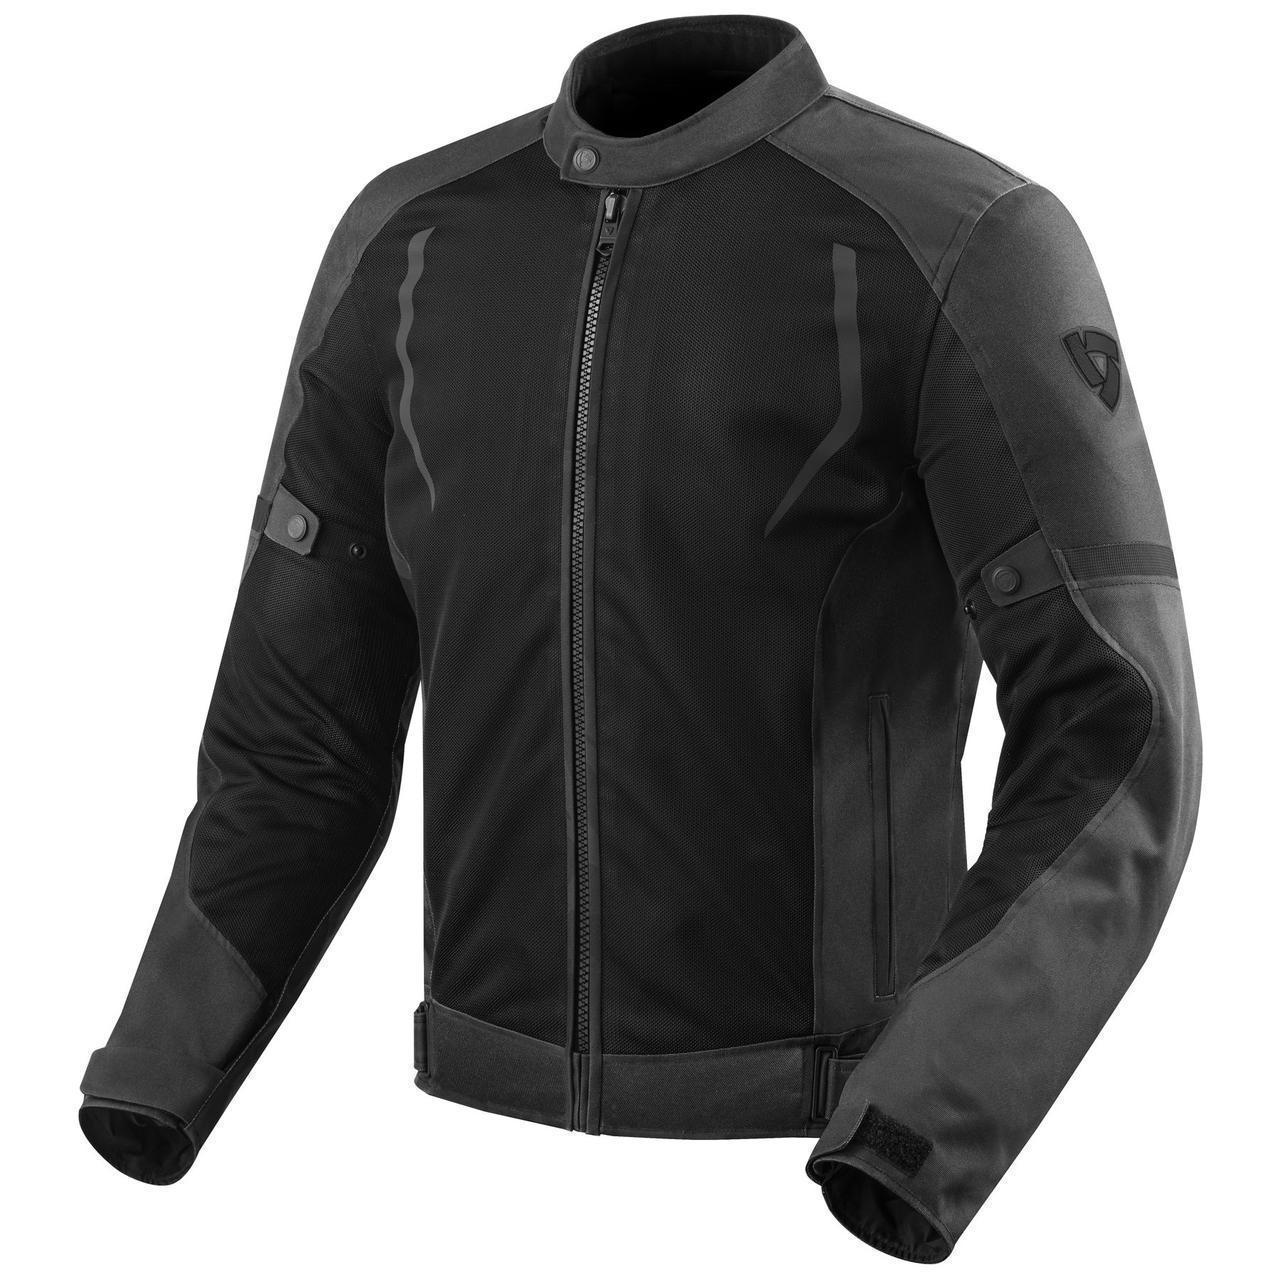 Мотокуртка Revit TORQUE текстиль р. 2XL black